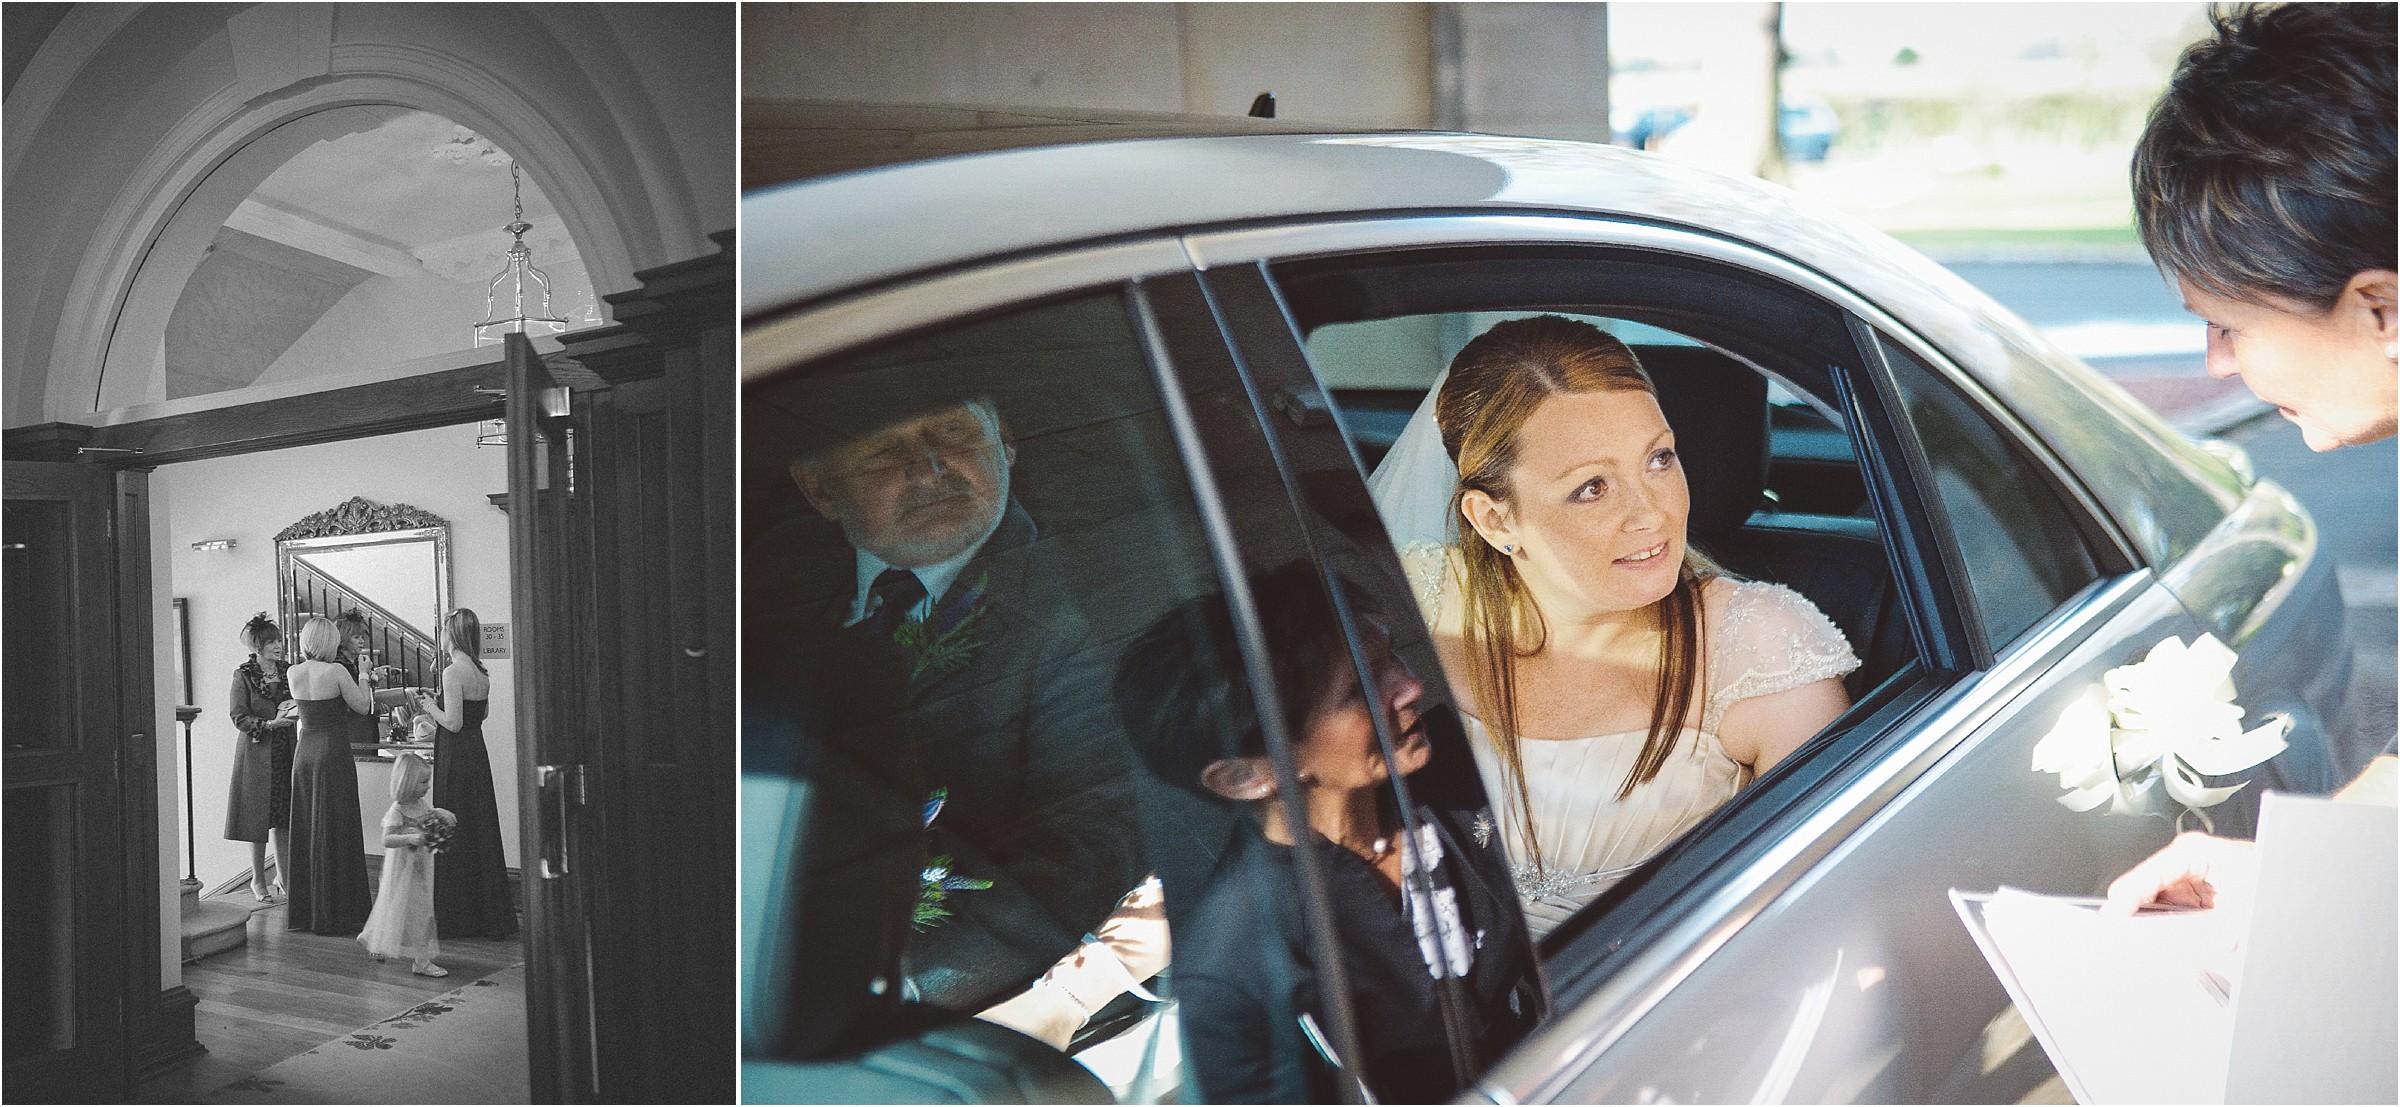 020 wedding photography doxford hall northumberlandDSC_0587e